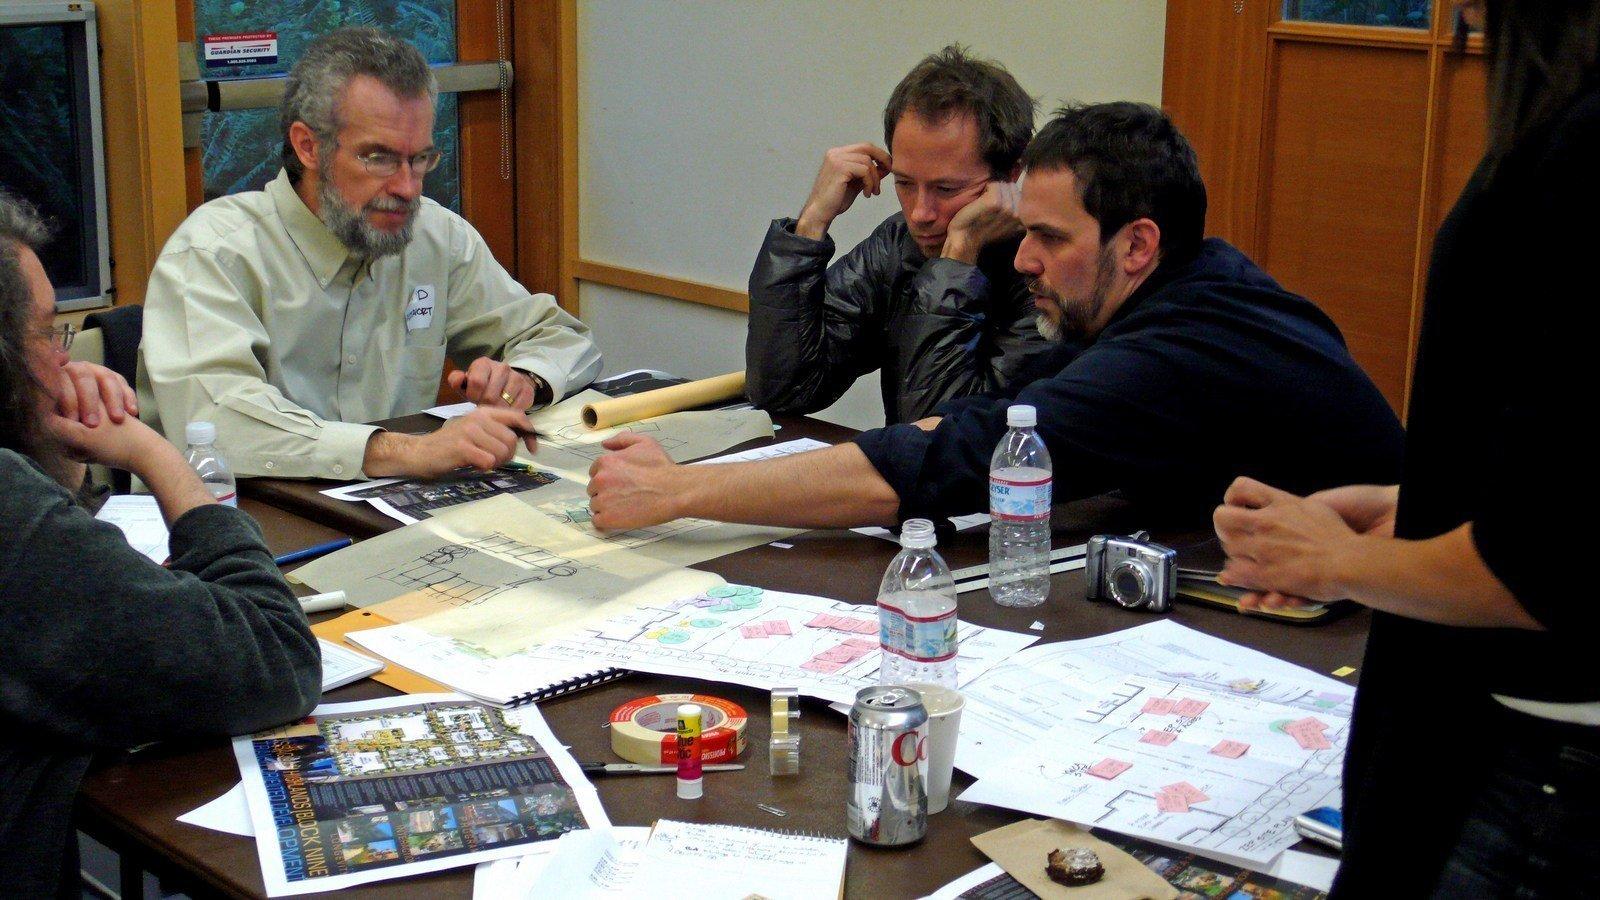 Photo 9 of 9 in A Zero-Energy Community: Part 2